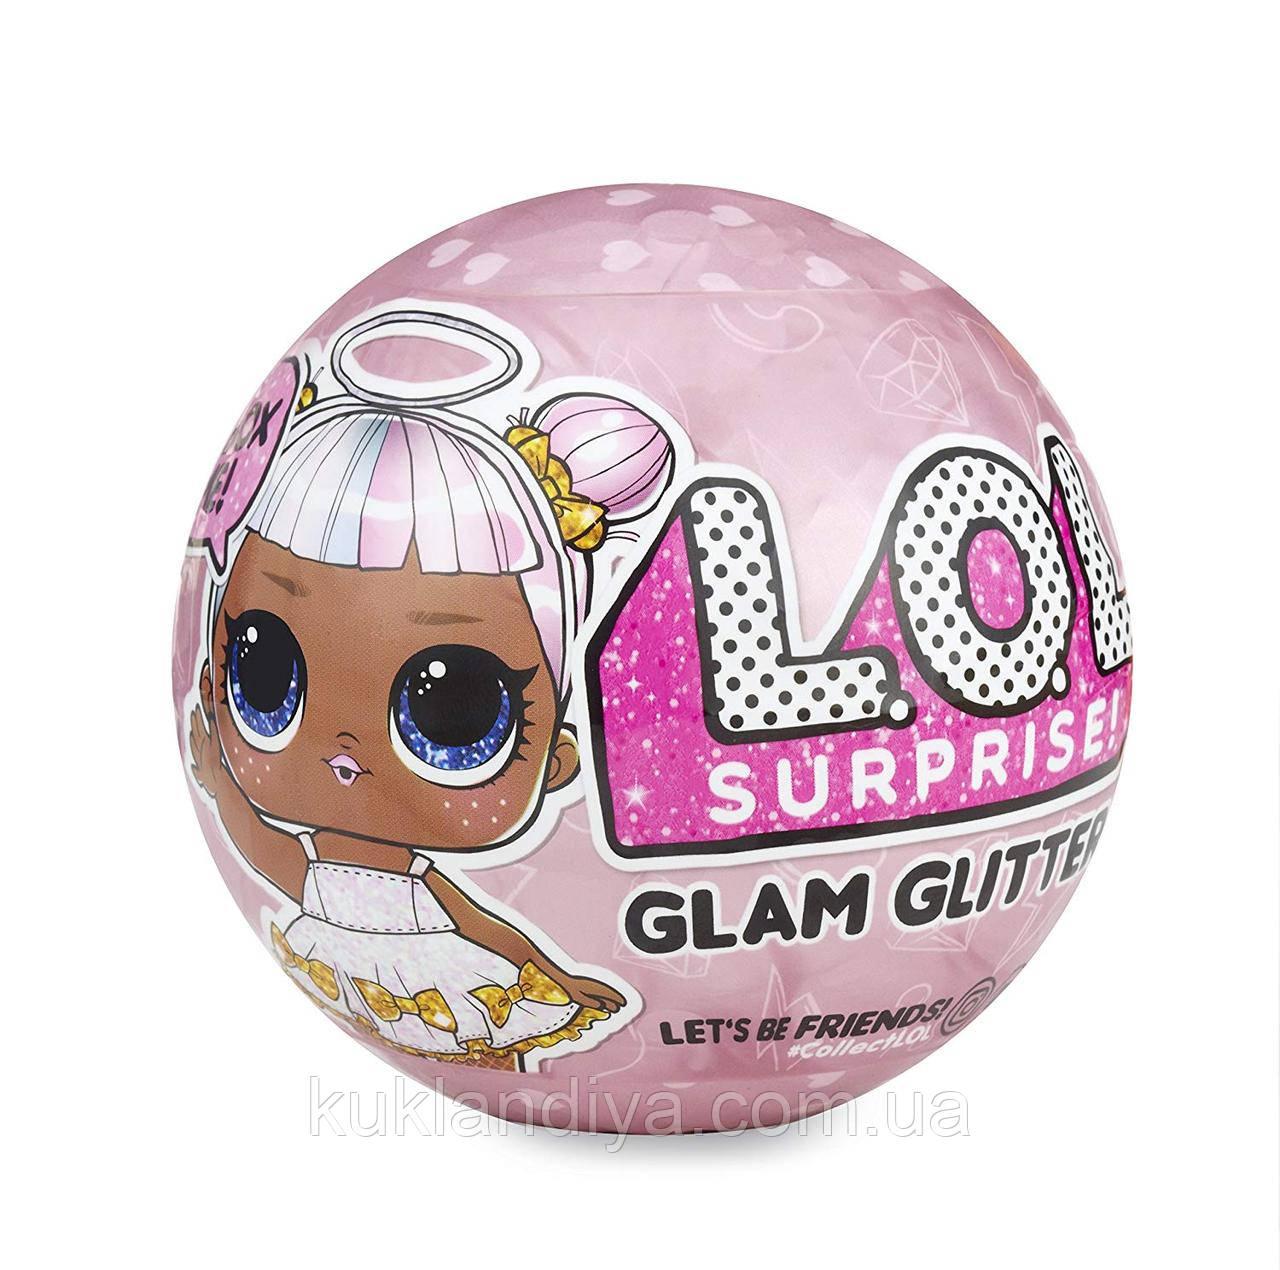 L.O.L. Surprise! Кукла Лол Глэм Глиттер блестящий сюрприз Glam Glitter Series Оригинал!